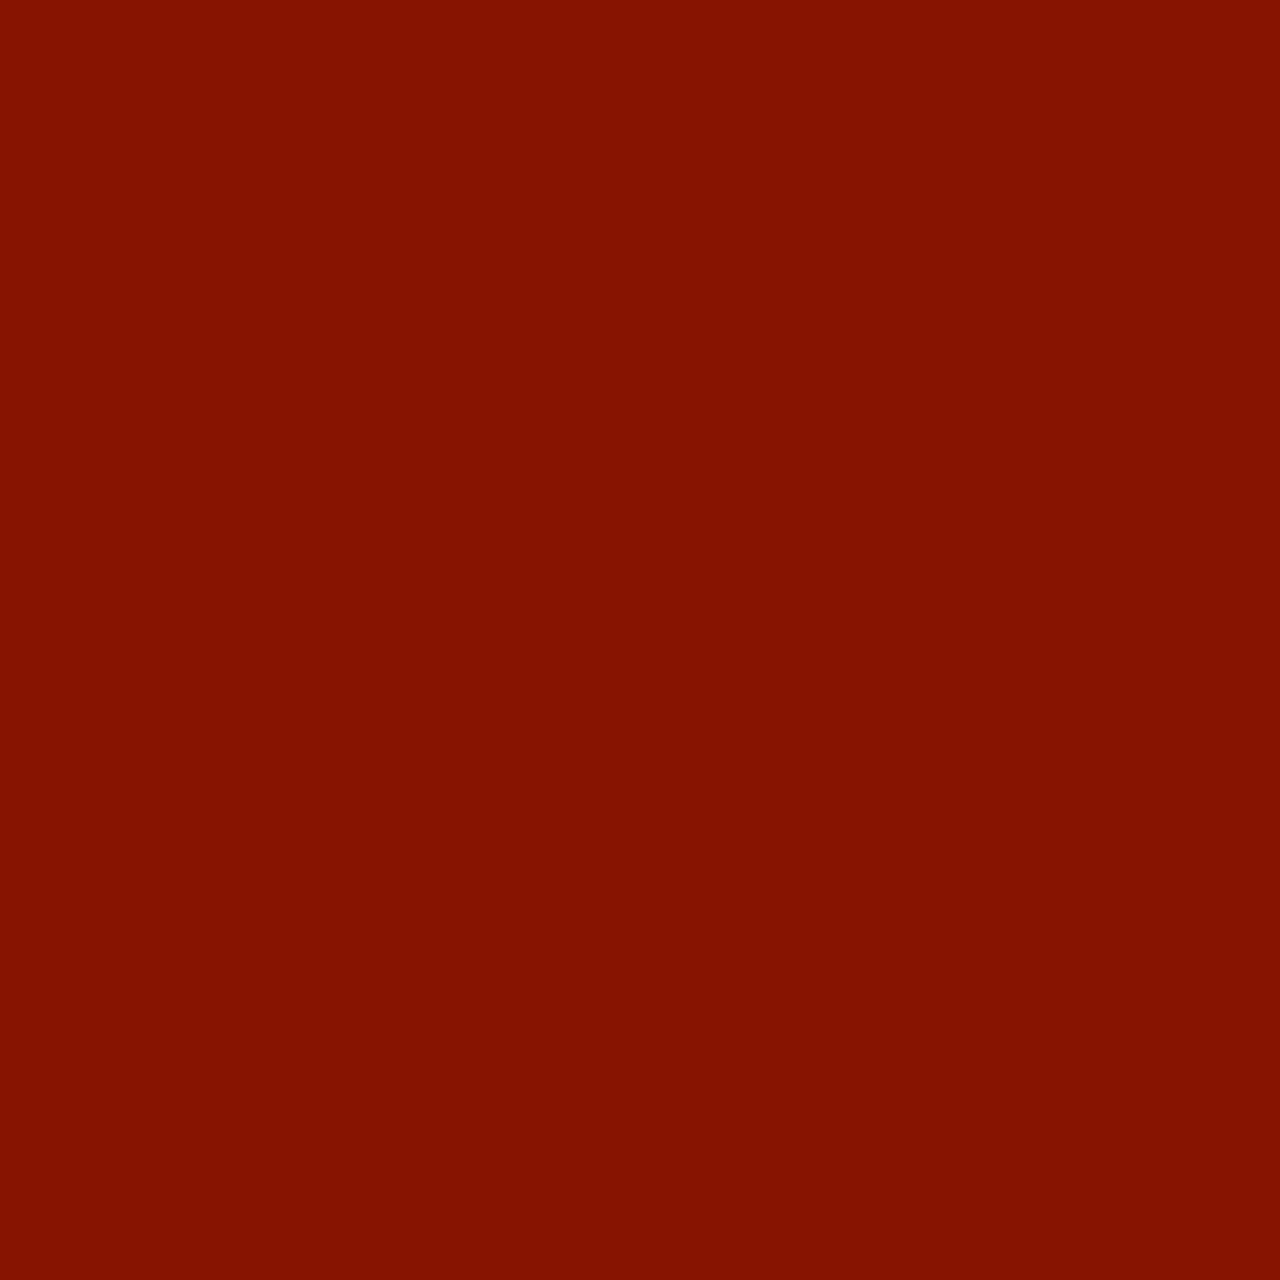 Oracal 651 Dark Red Permanent Adhesive Vinyl